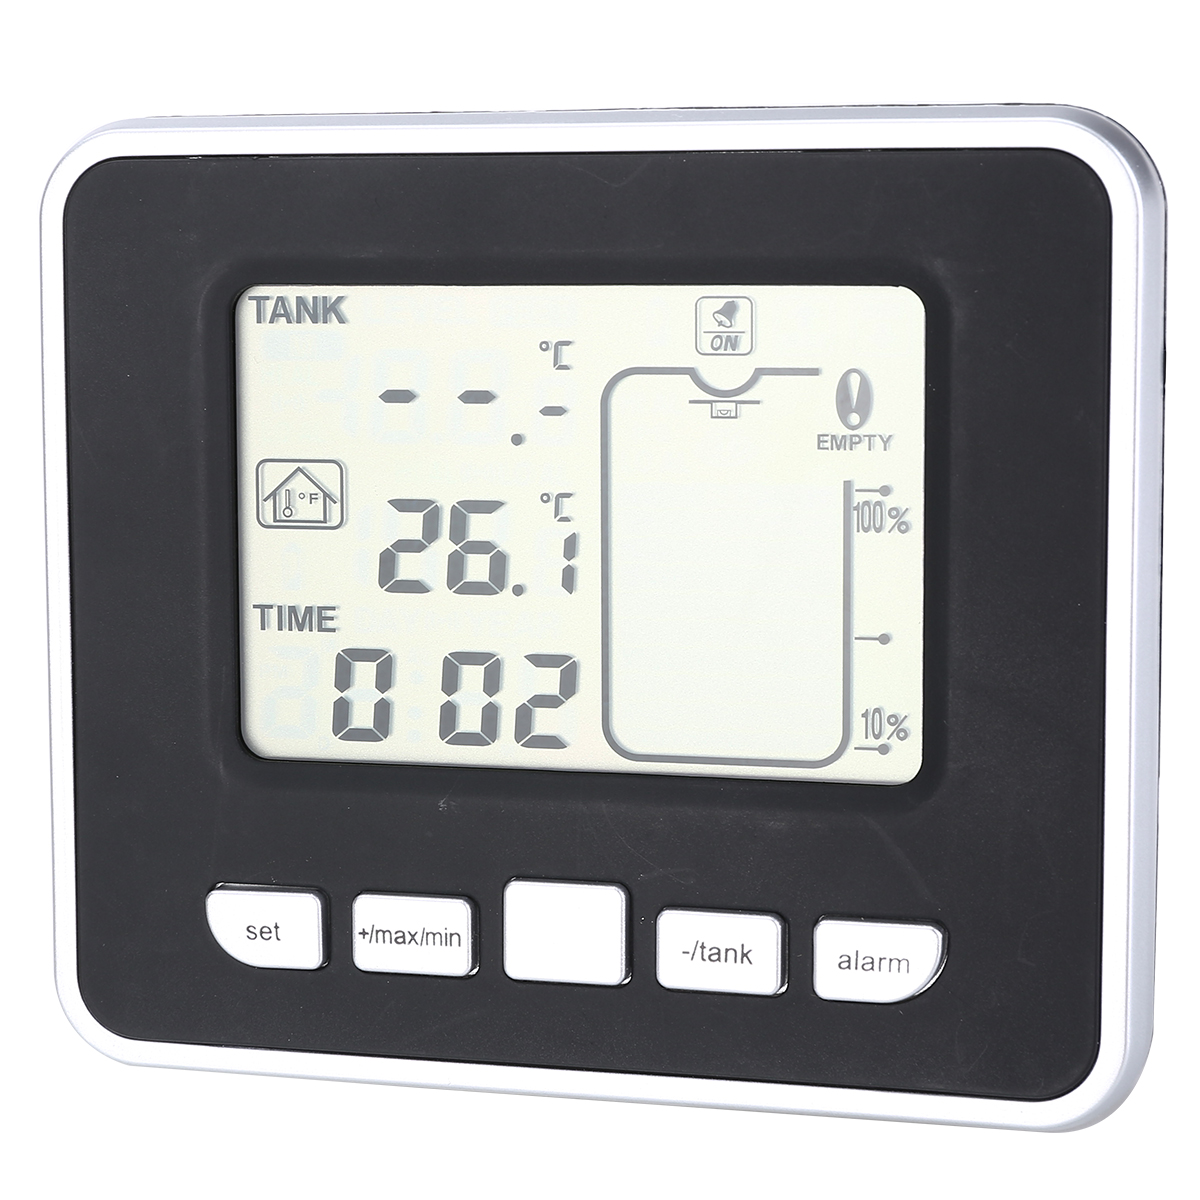 Ultrasonic Water Tank Indicator Liquid Depth Level Meter Sensor with Temperature Display Time Alarm Transmitter Measuring